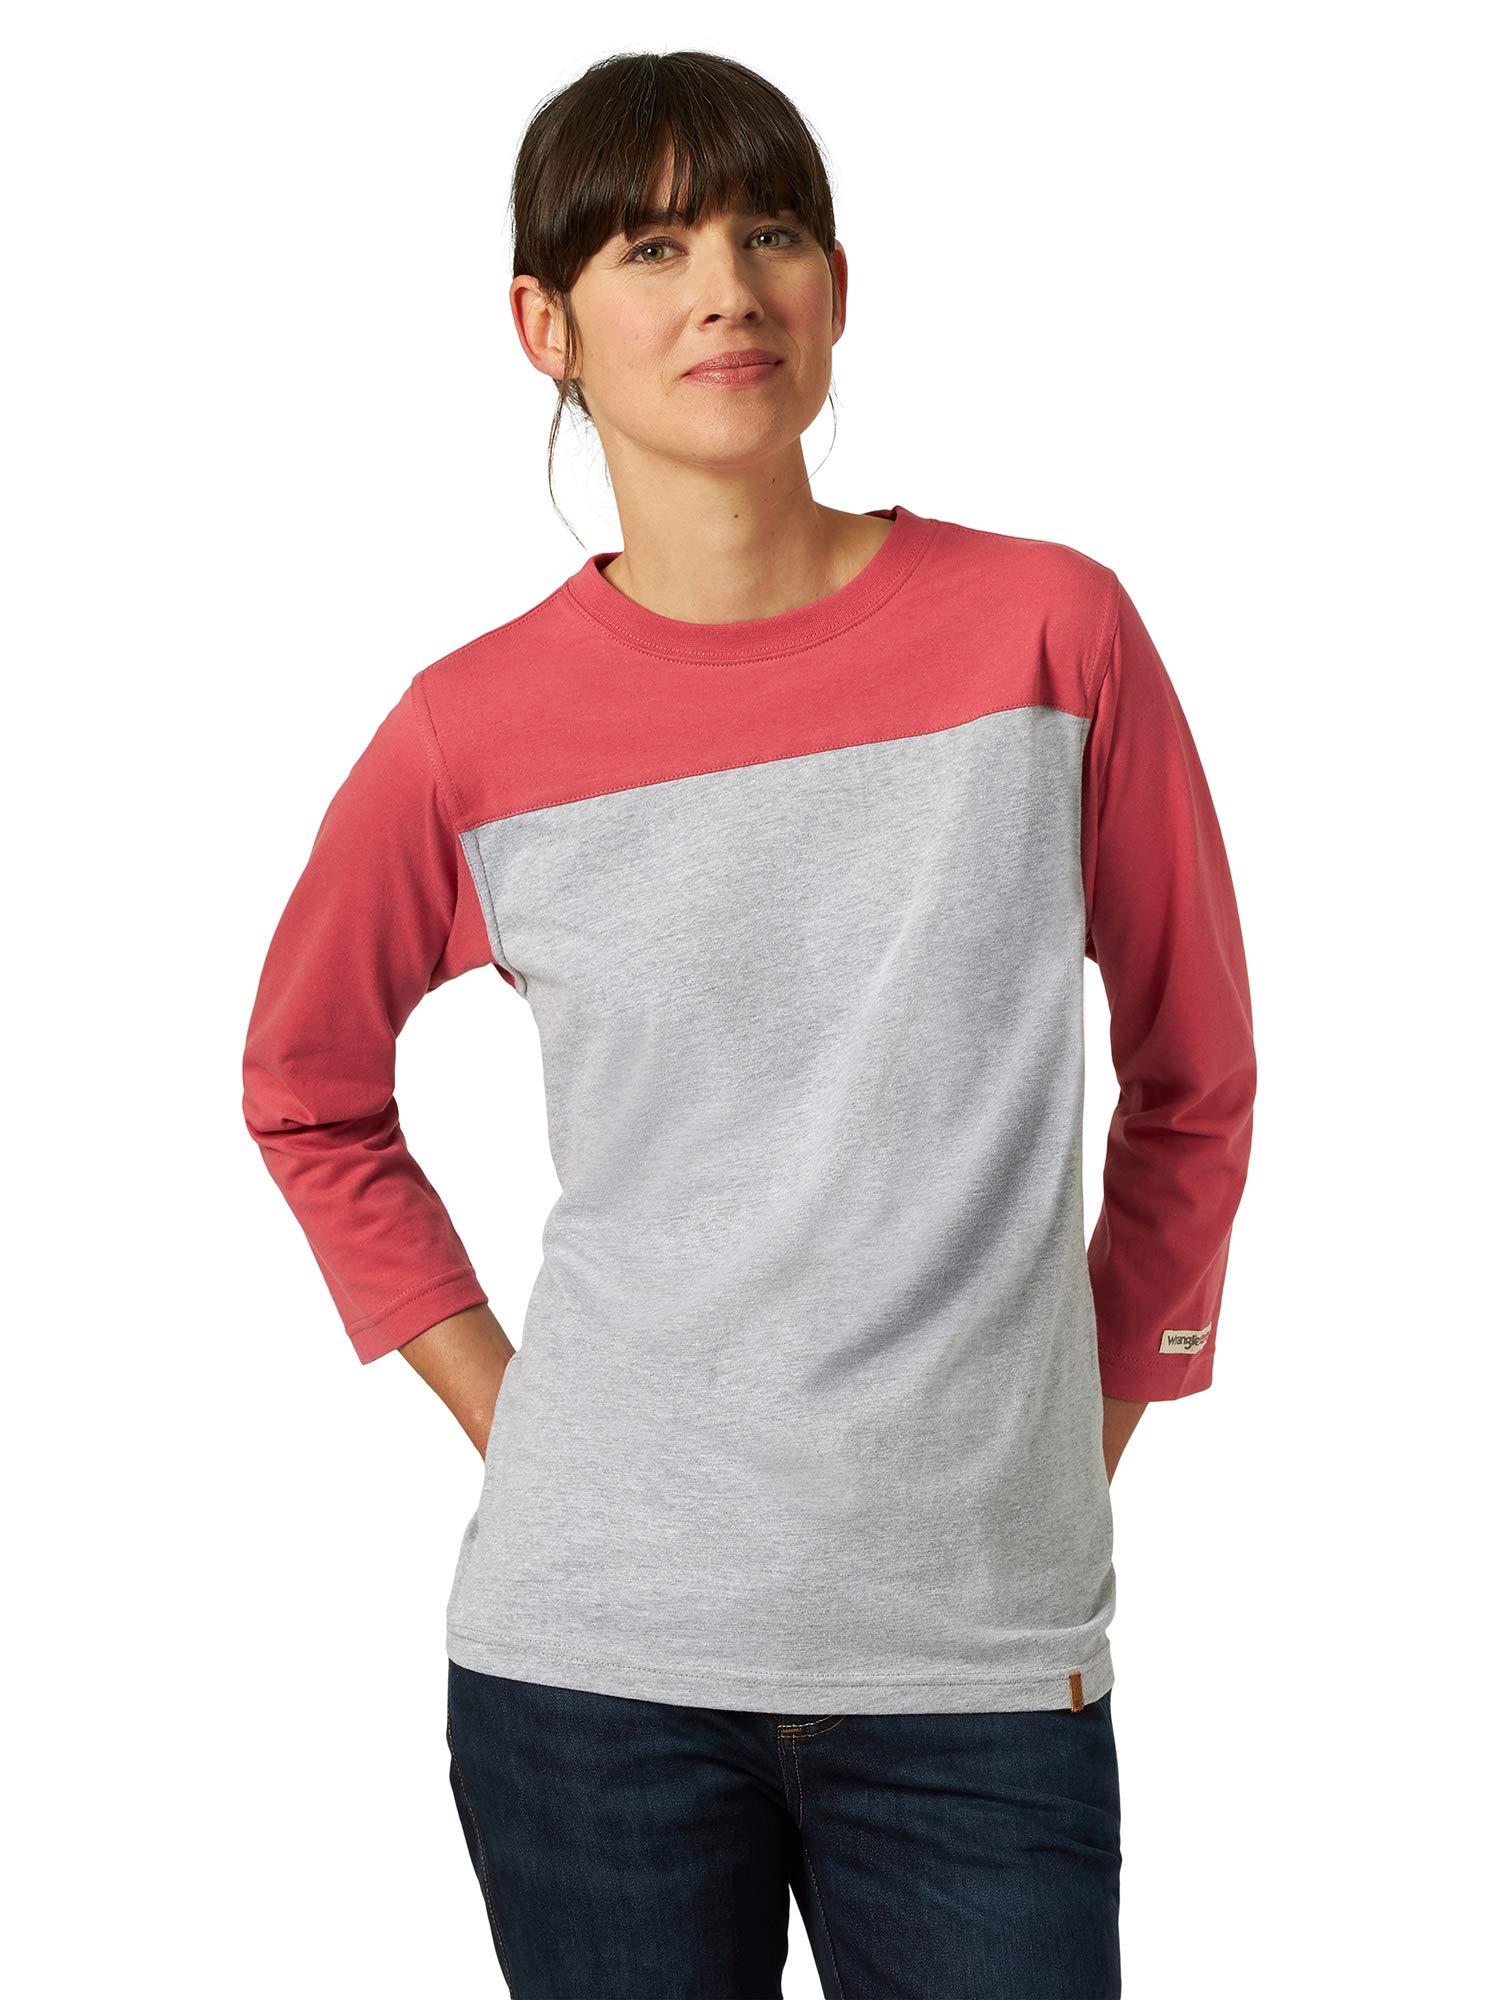 Wrangler Riggs Workwear Women's 3/4 Sleeve Performance T-shirt